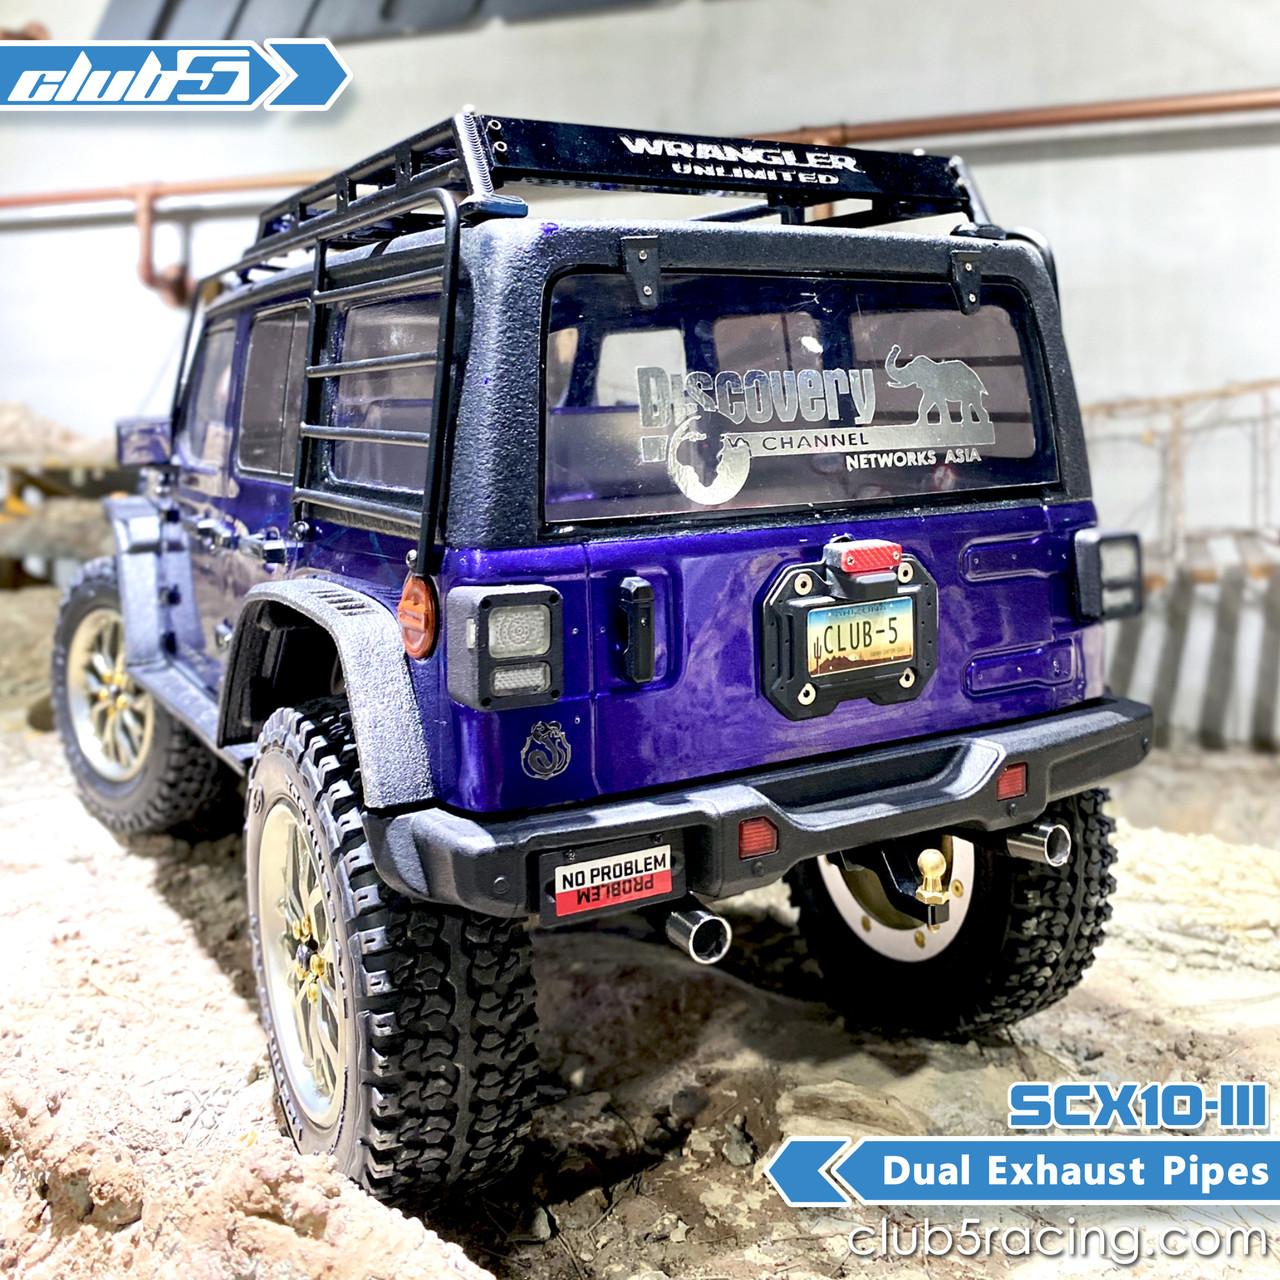 Dual Performance Exhaust for SCX10 III Jeep JL Wrangler